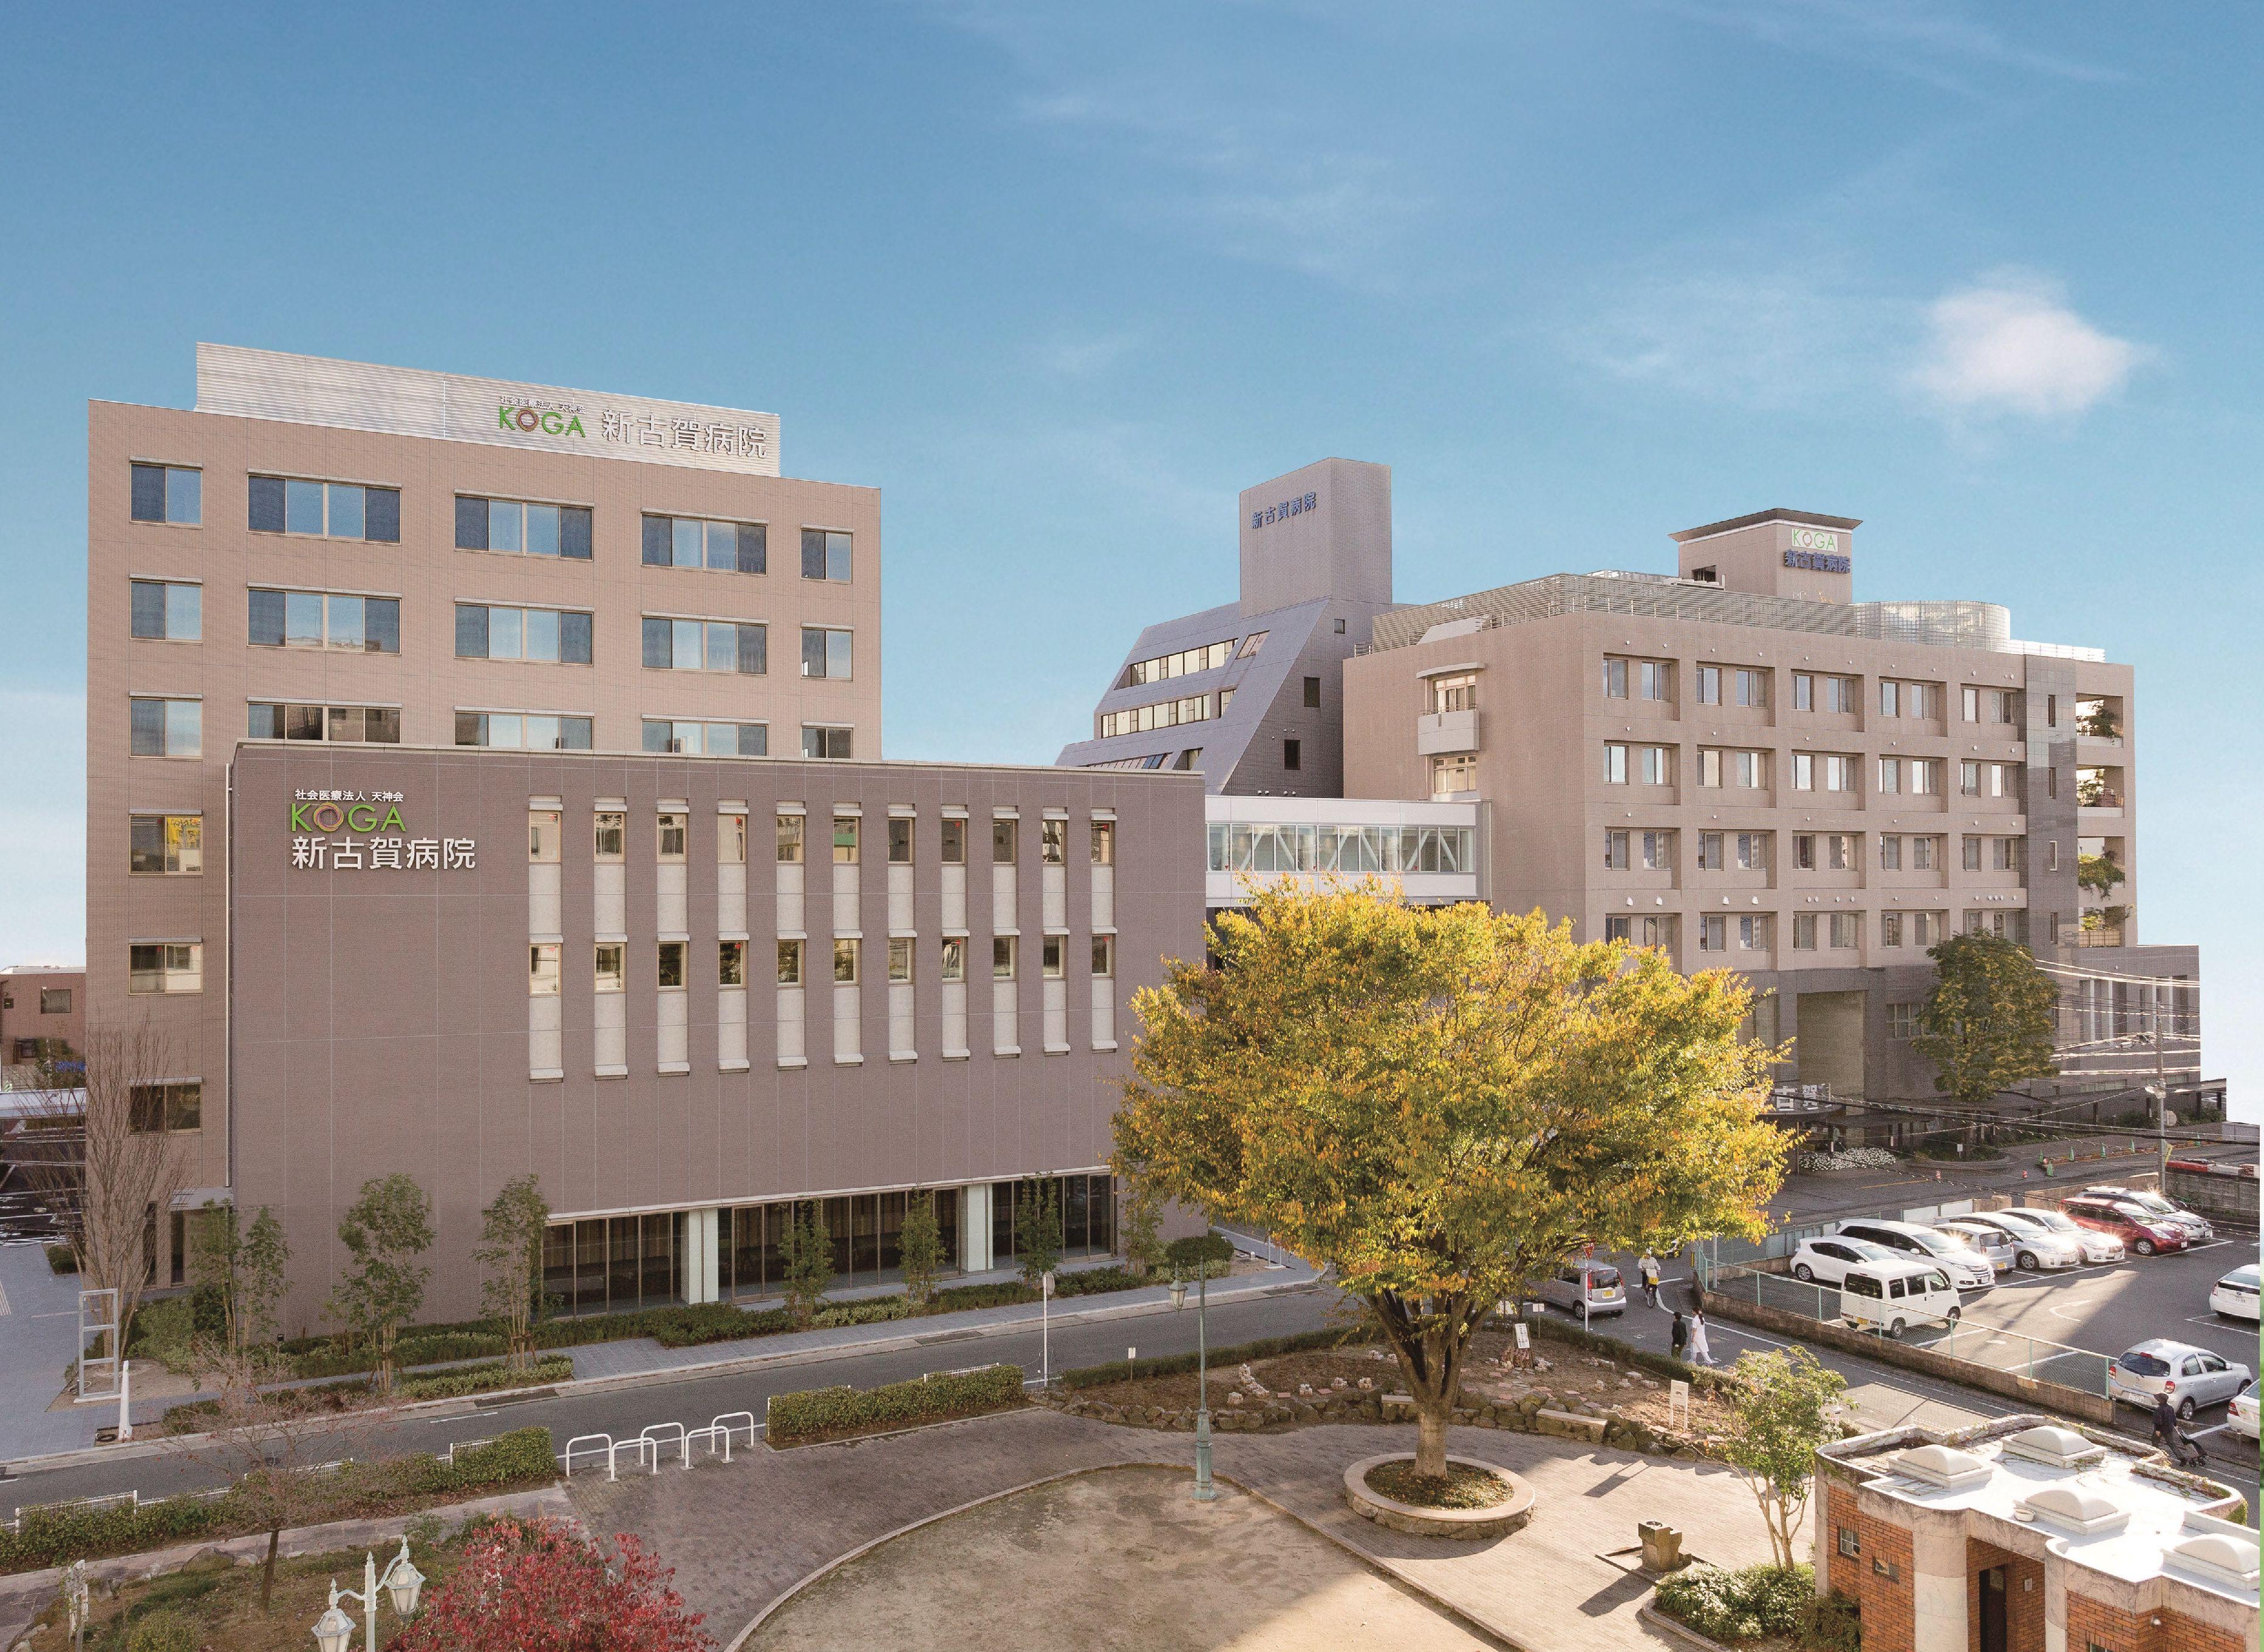 Shin Koga Hospital